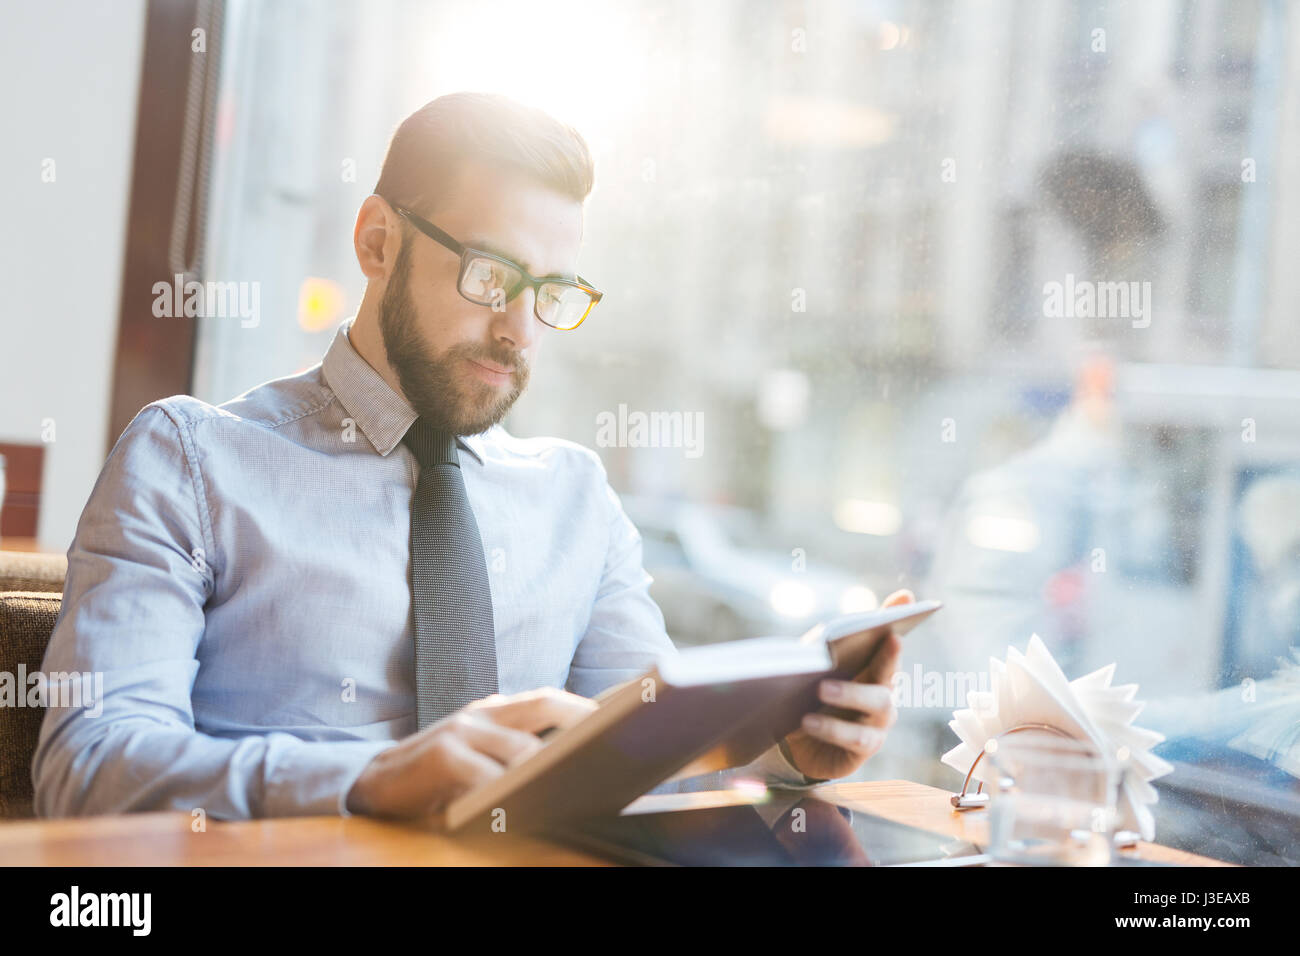 Busy entrepreneur - Stock Image